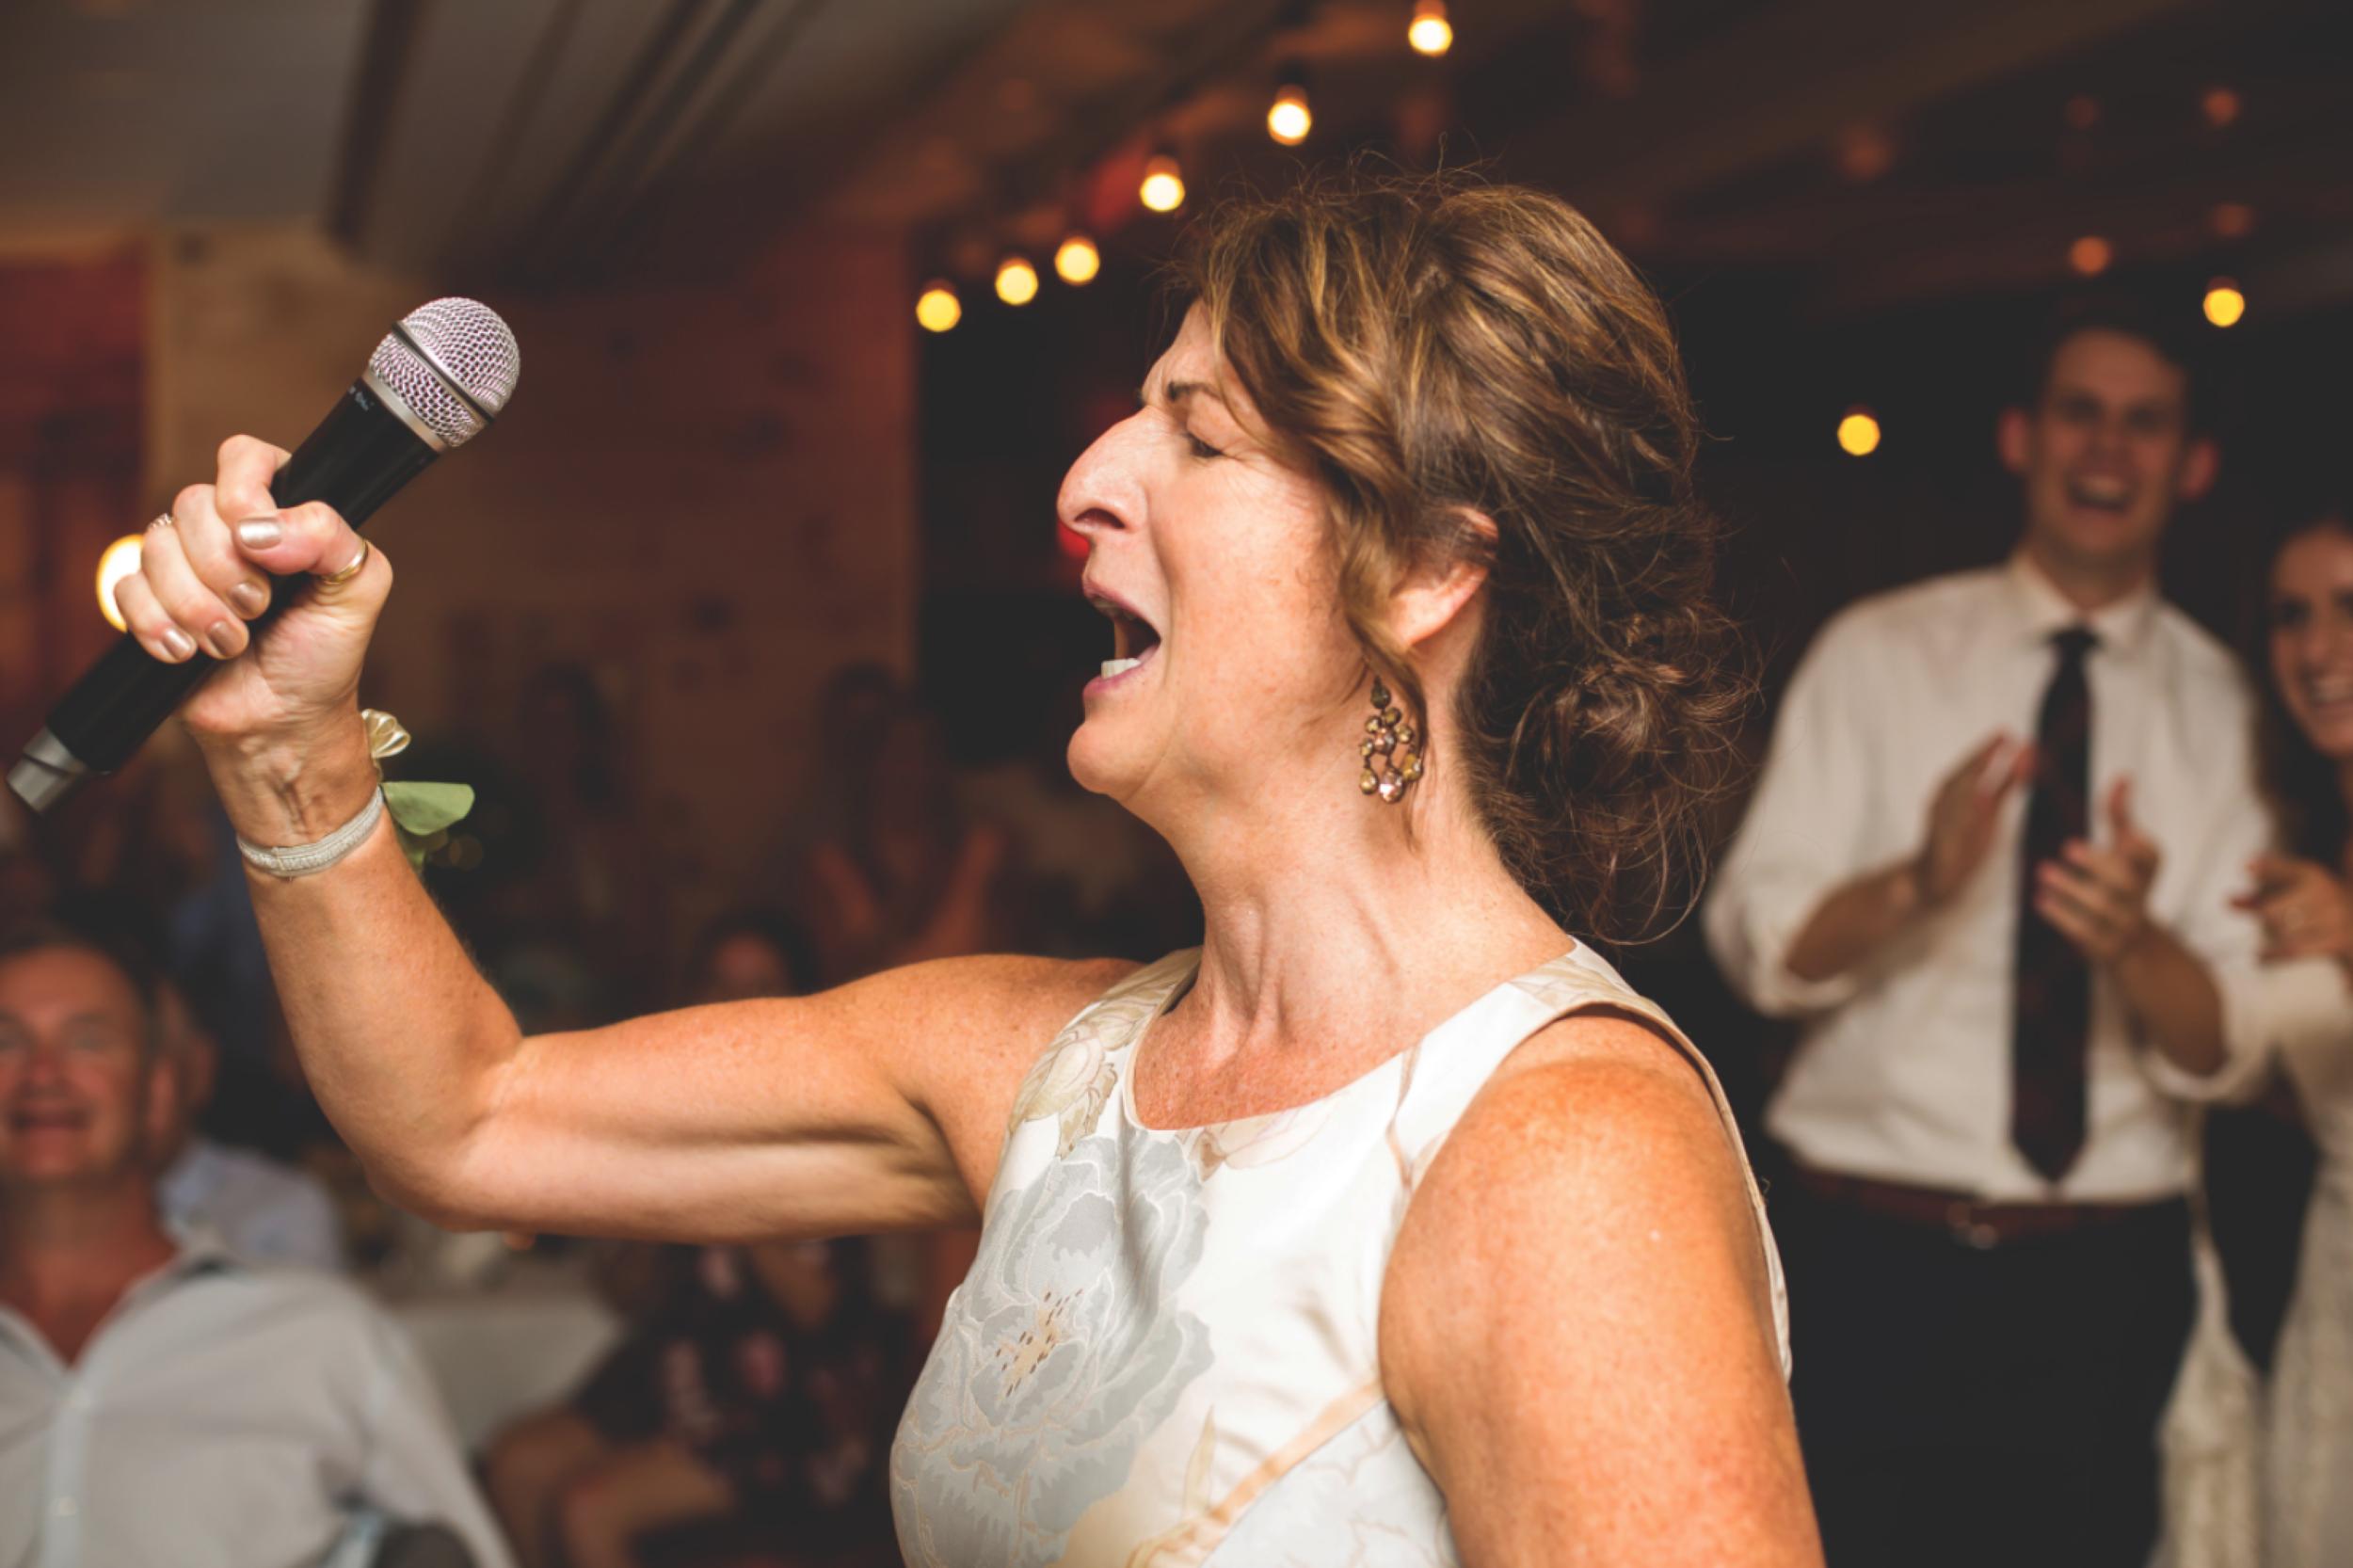 Wedding-Photos-Muskoka-Clevelands-House-Photographer-Wedding-Hamilton-GTA-Niagara-Oakville-Moments-by-Lauren-Photography-Photo-Image-108.png